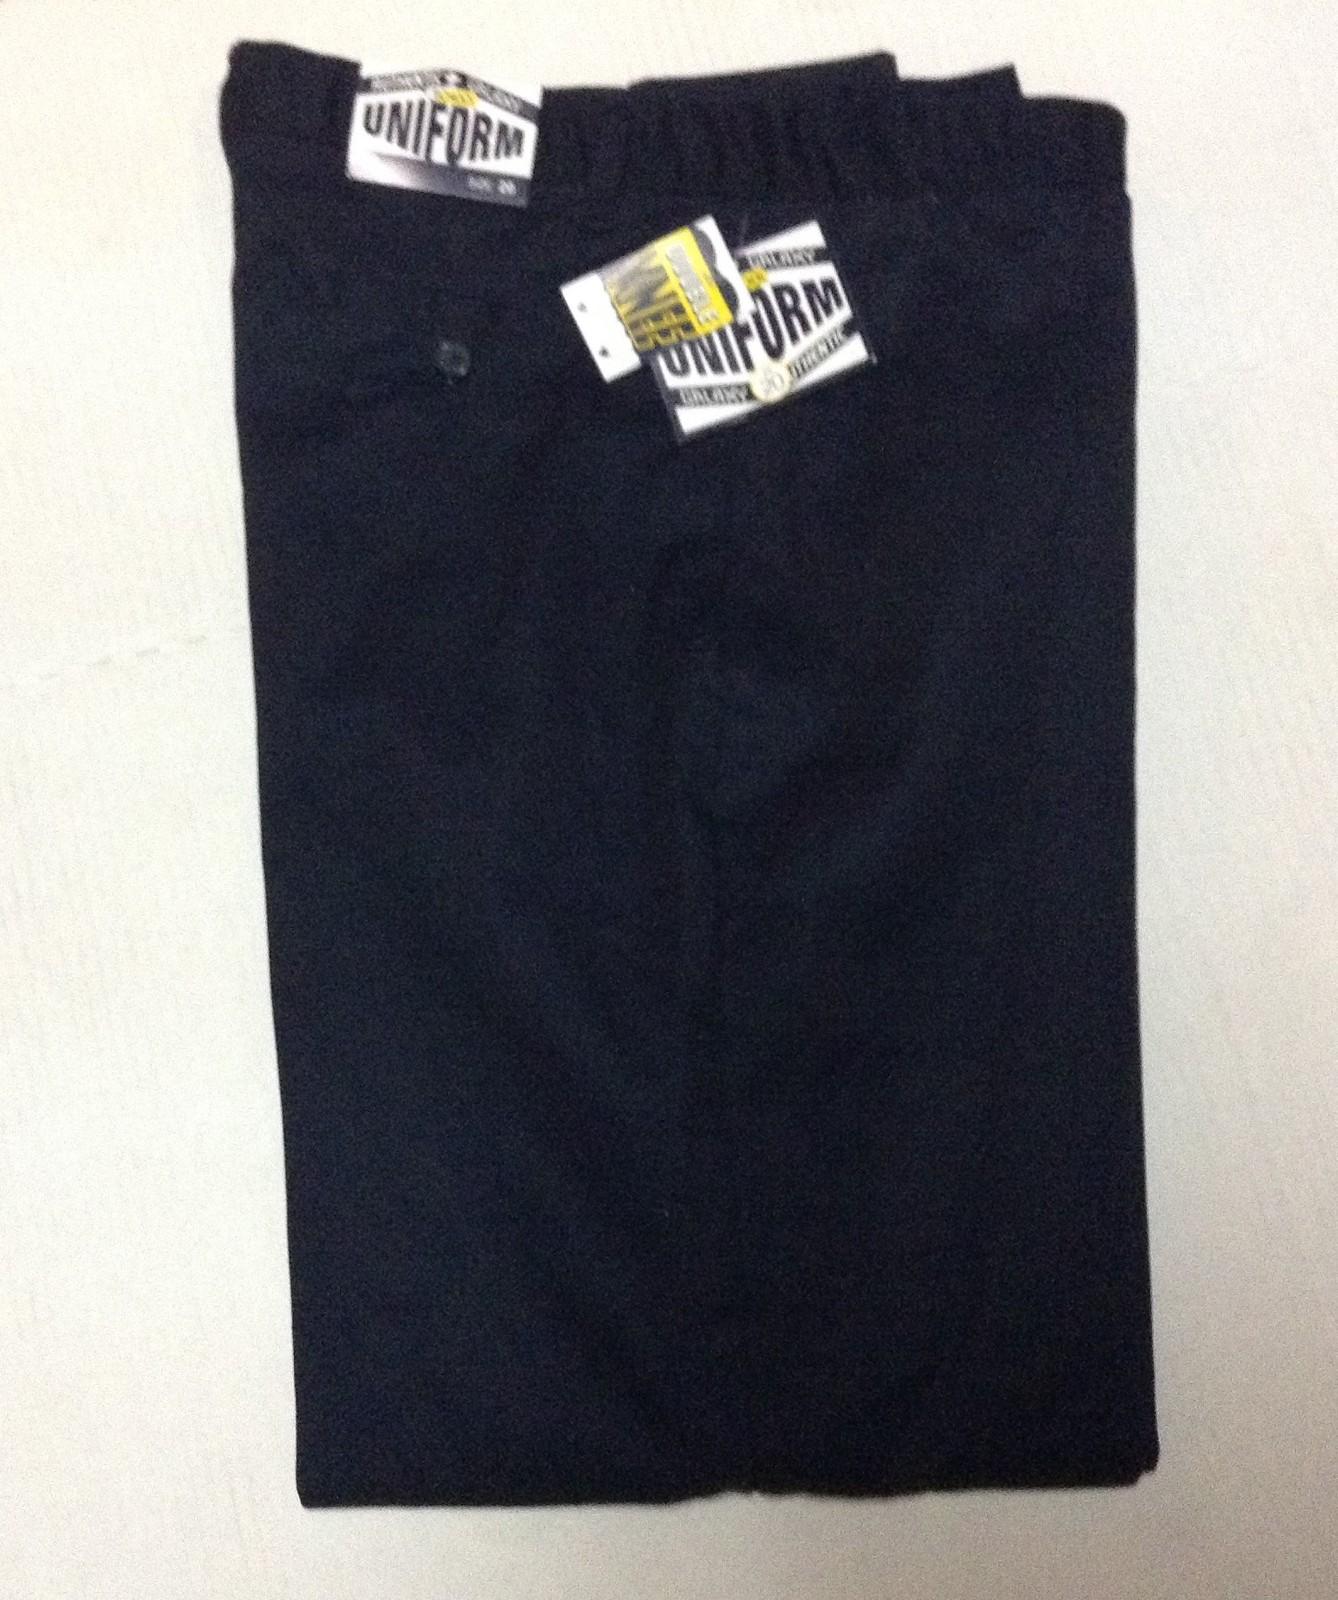 Galaxy Authentic Boys School Uniform Pants Black NWT Sz 20 Double Knee XBF-120N